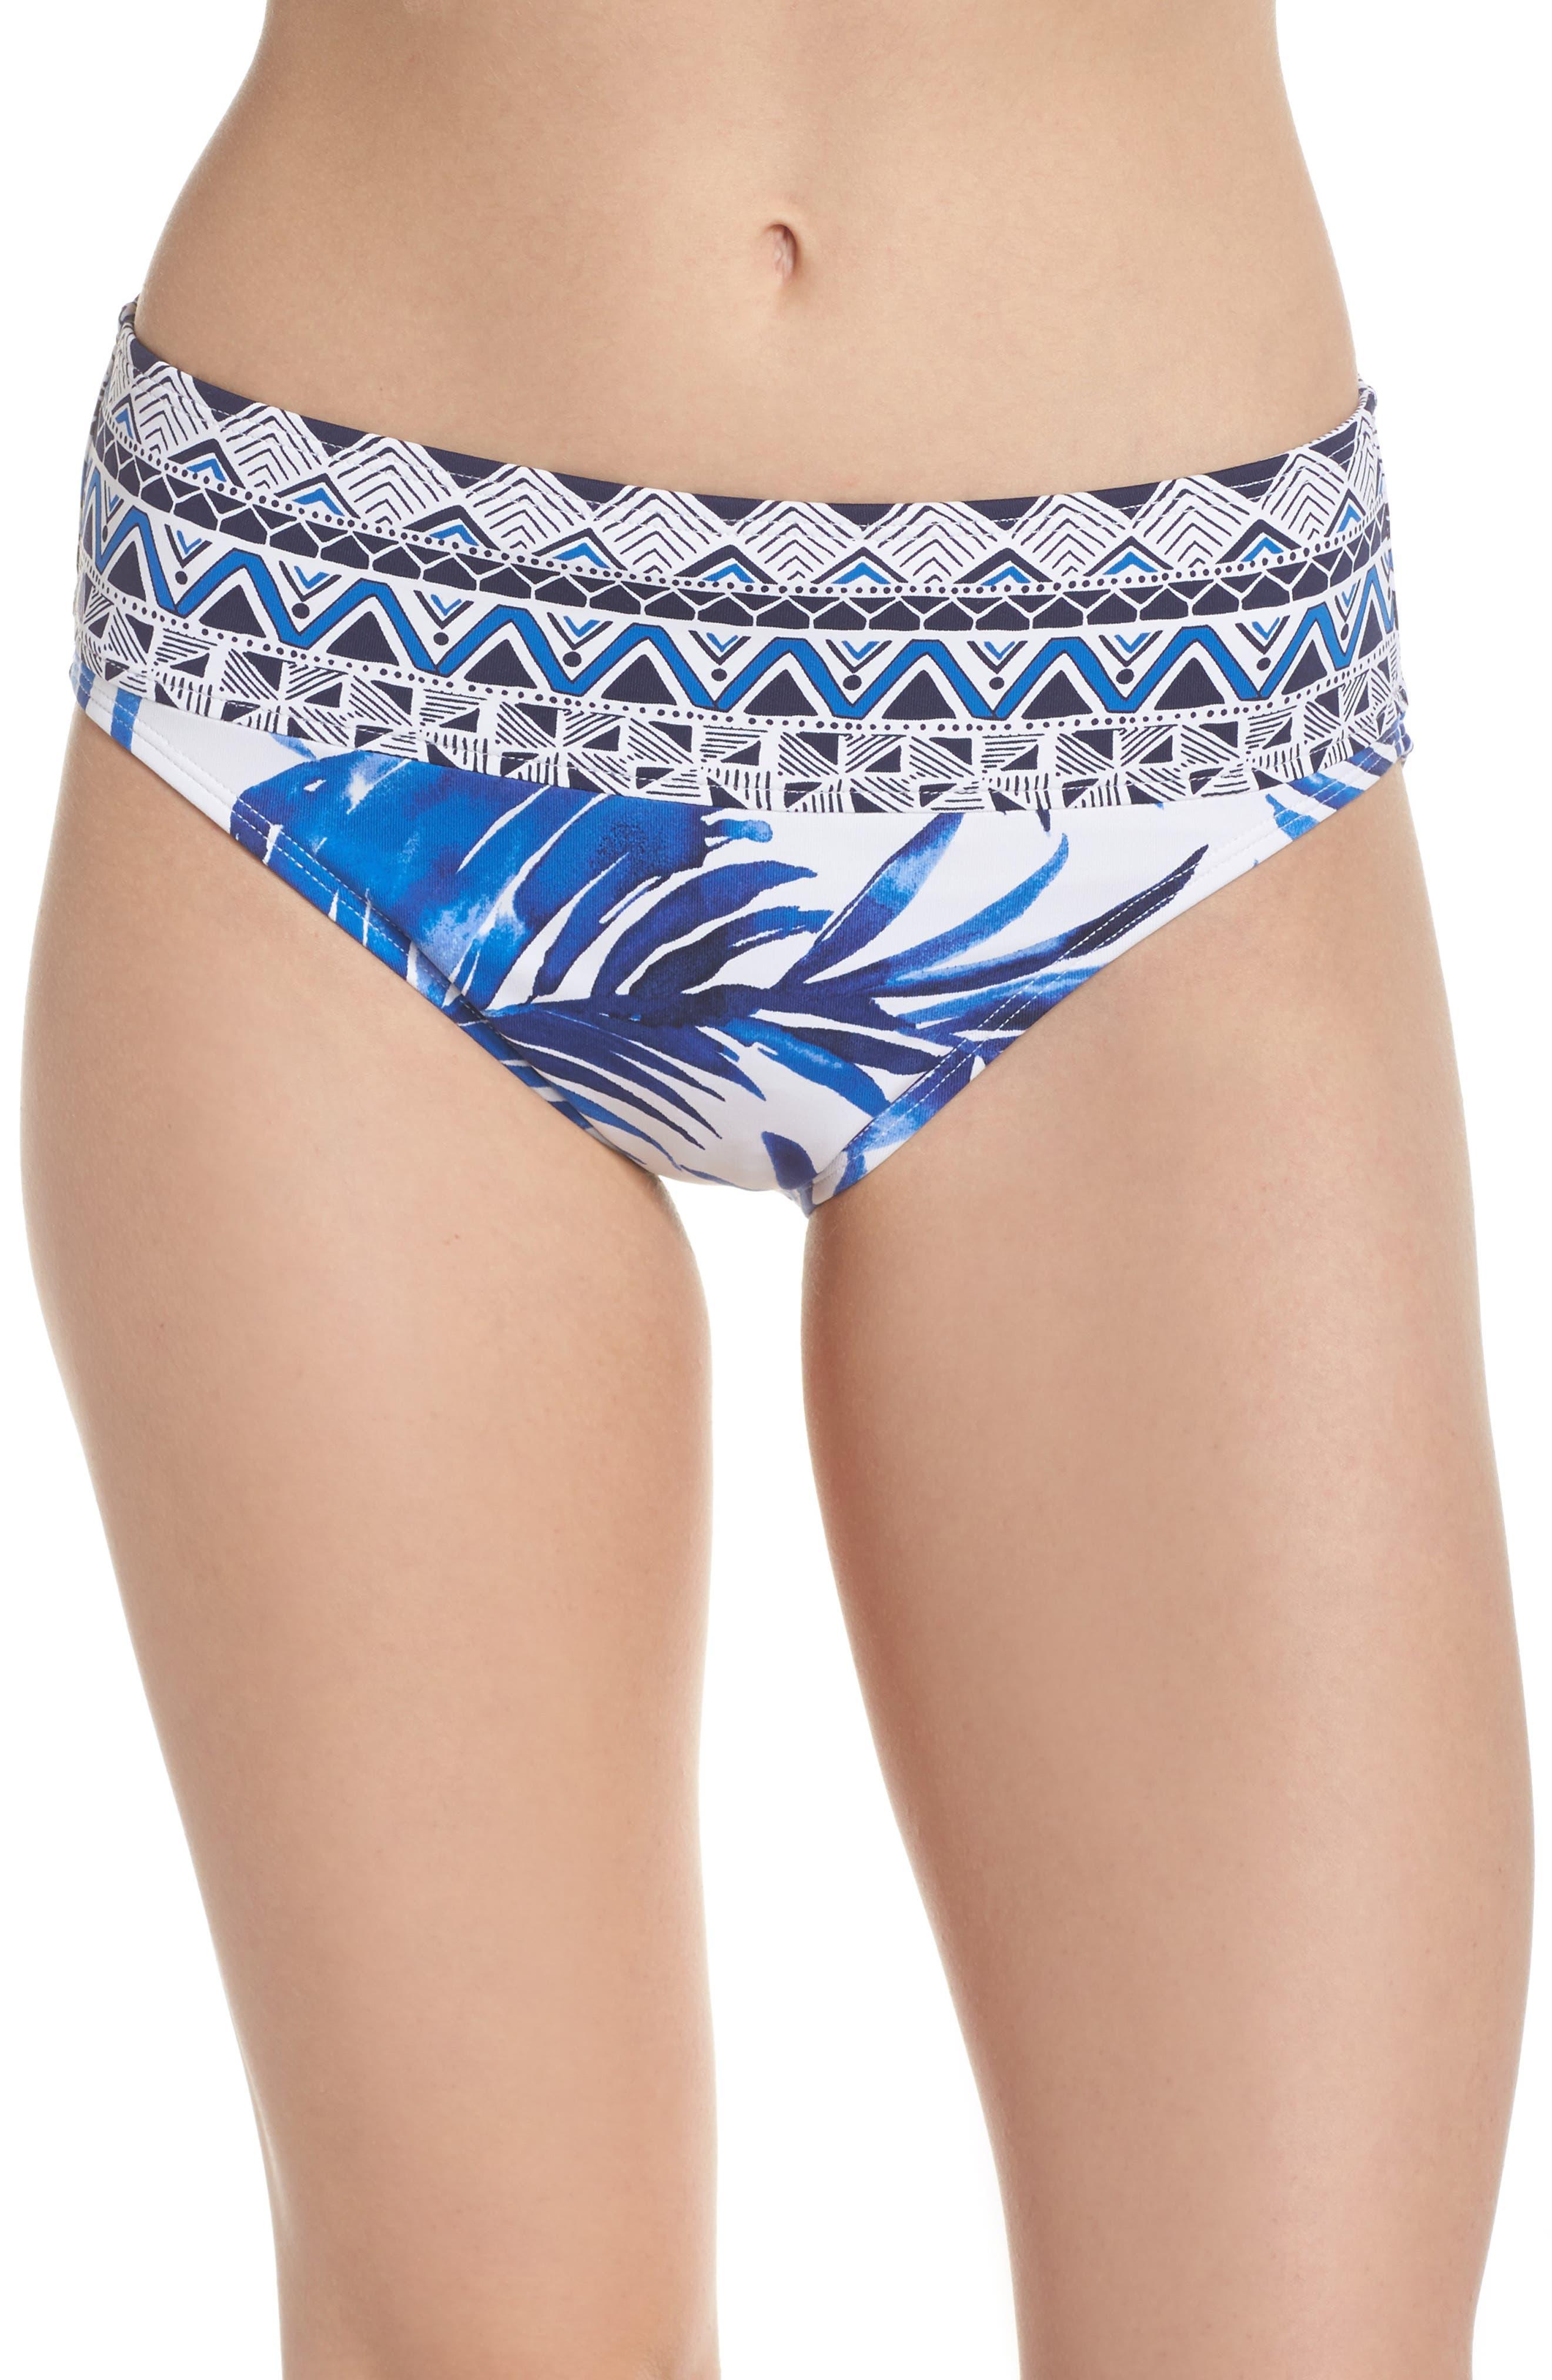 Fuller Fronds High Waist Bikini Bottoms,                         Main,                         color, WHITE